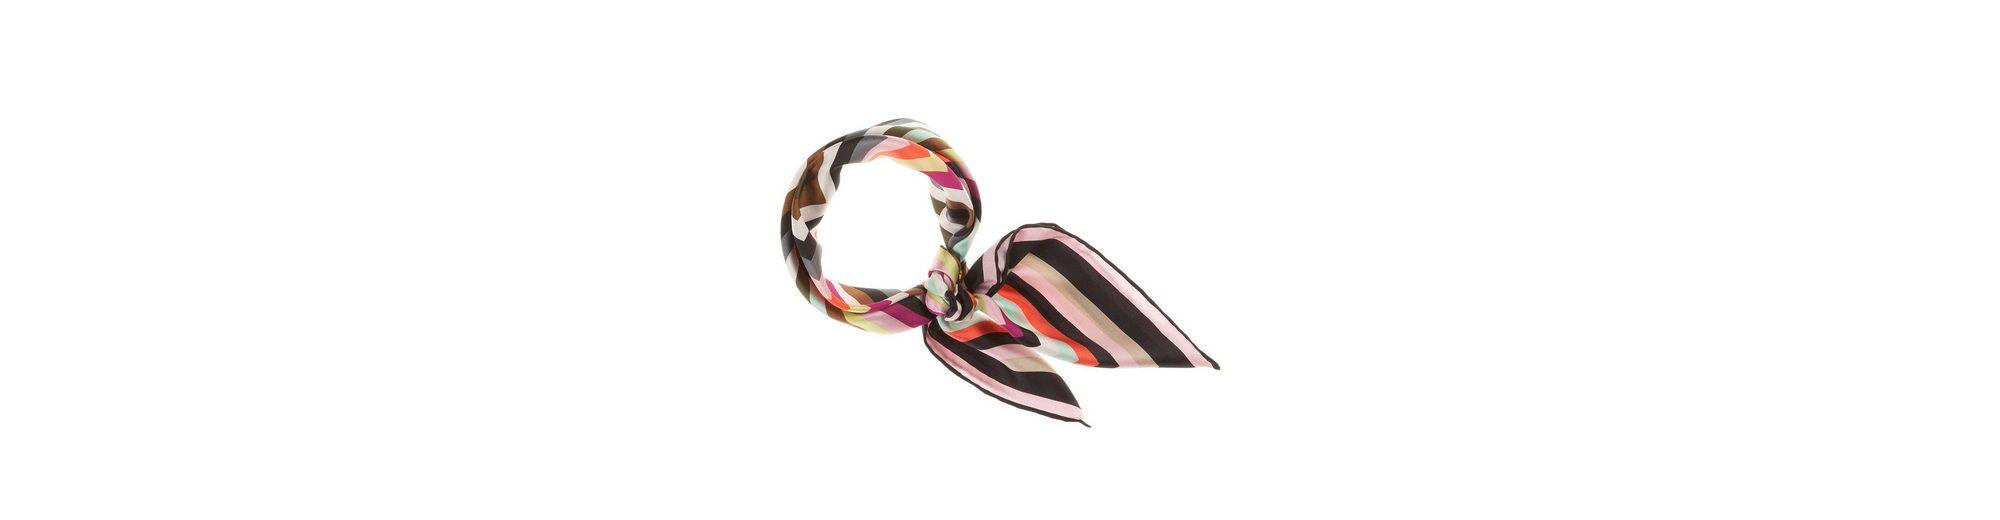 CODELLO Seiden-Twill mit Regenbogen-Muster